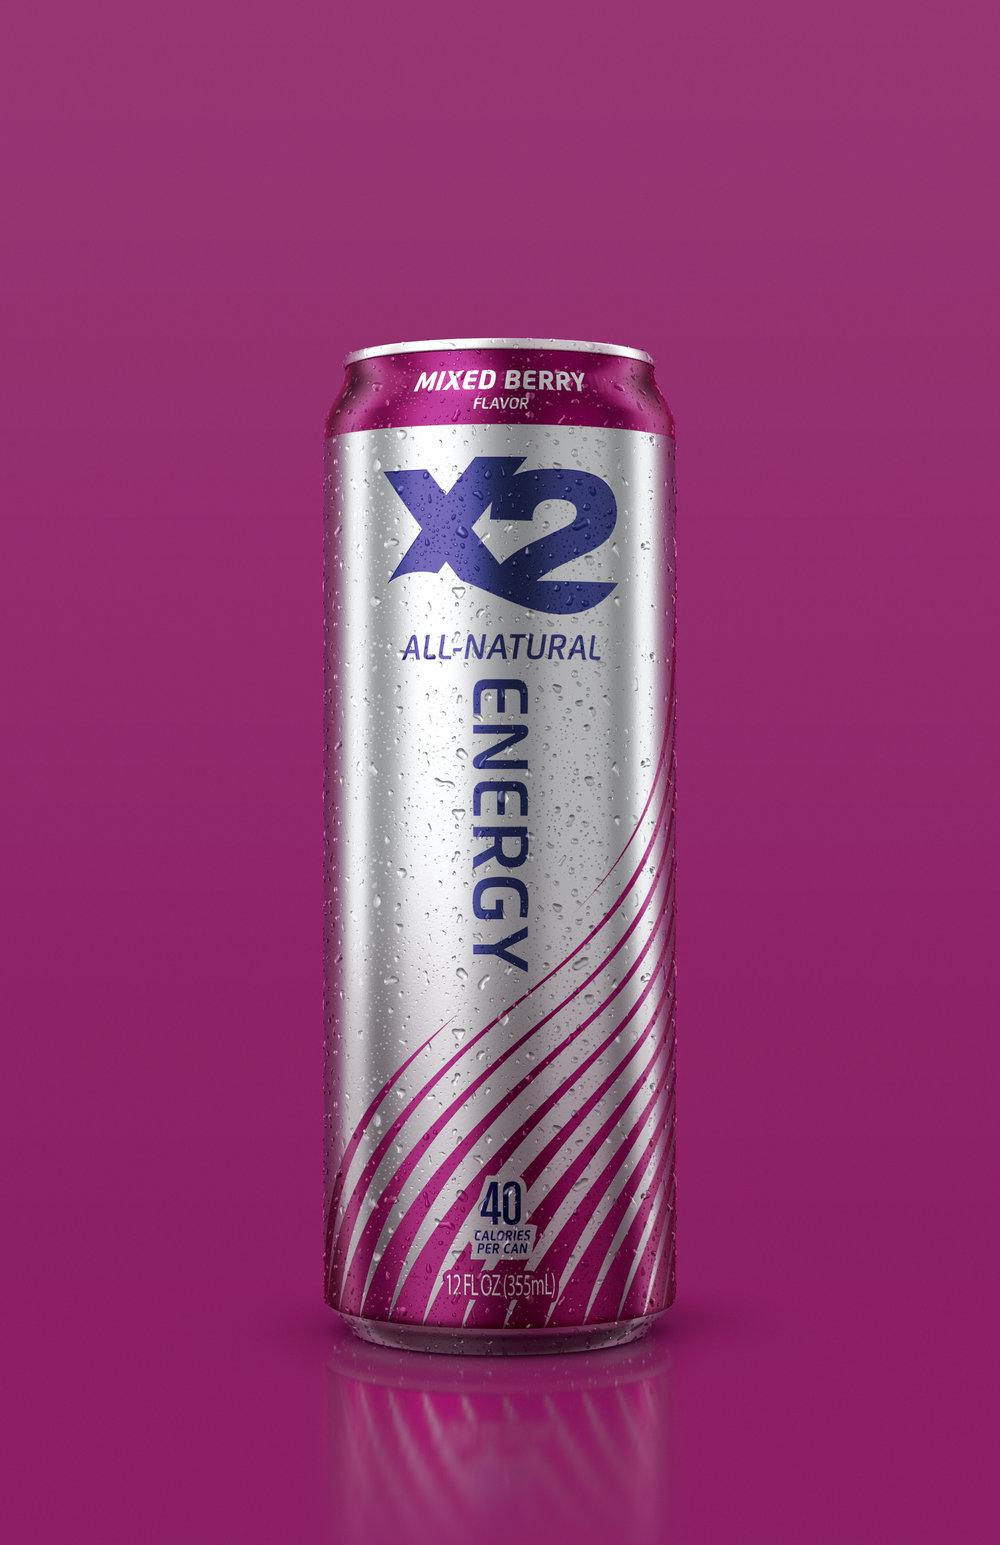 180425_CHASE_X2_ENERGY_CAN_MXDBRY_HR_LV.jpg